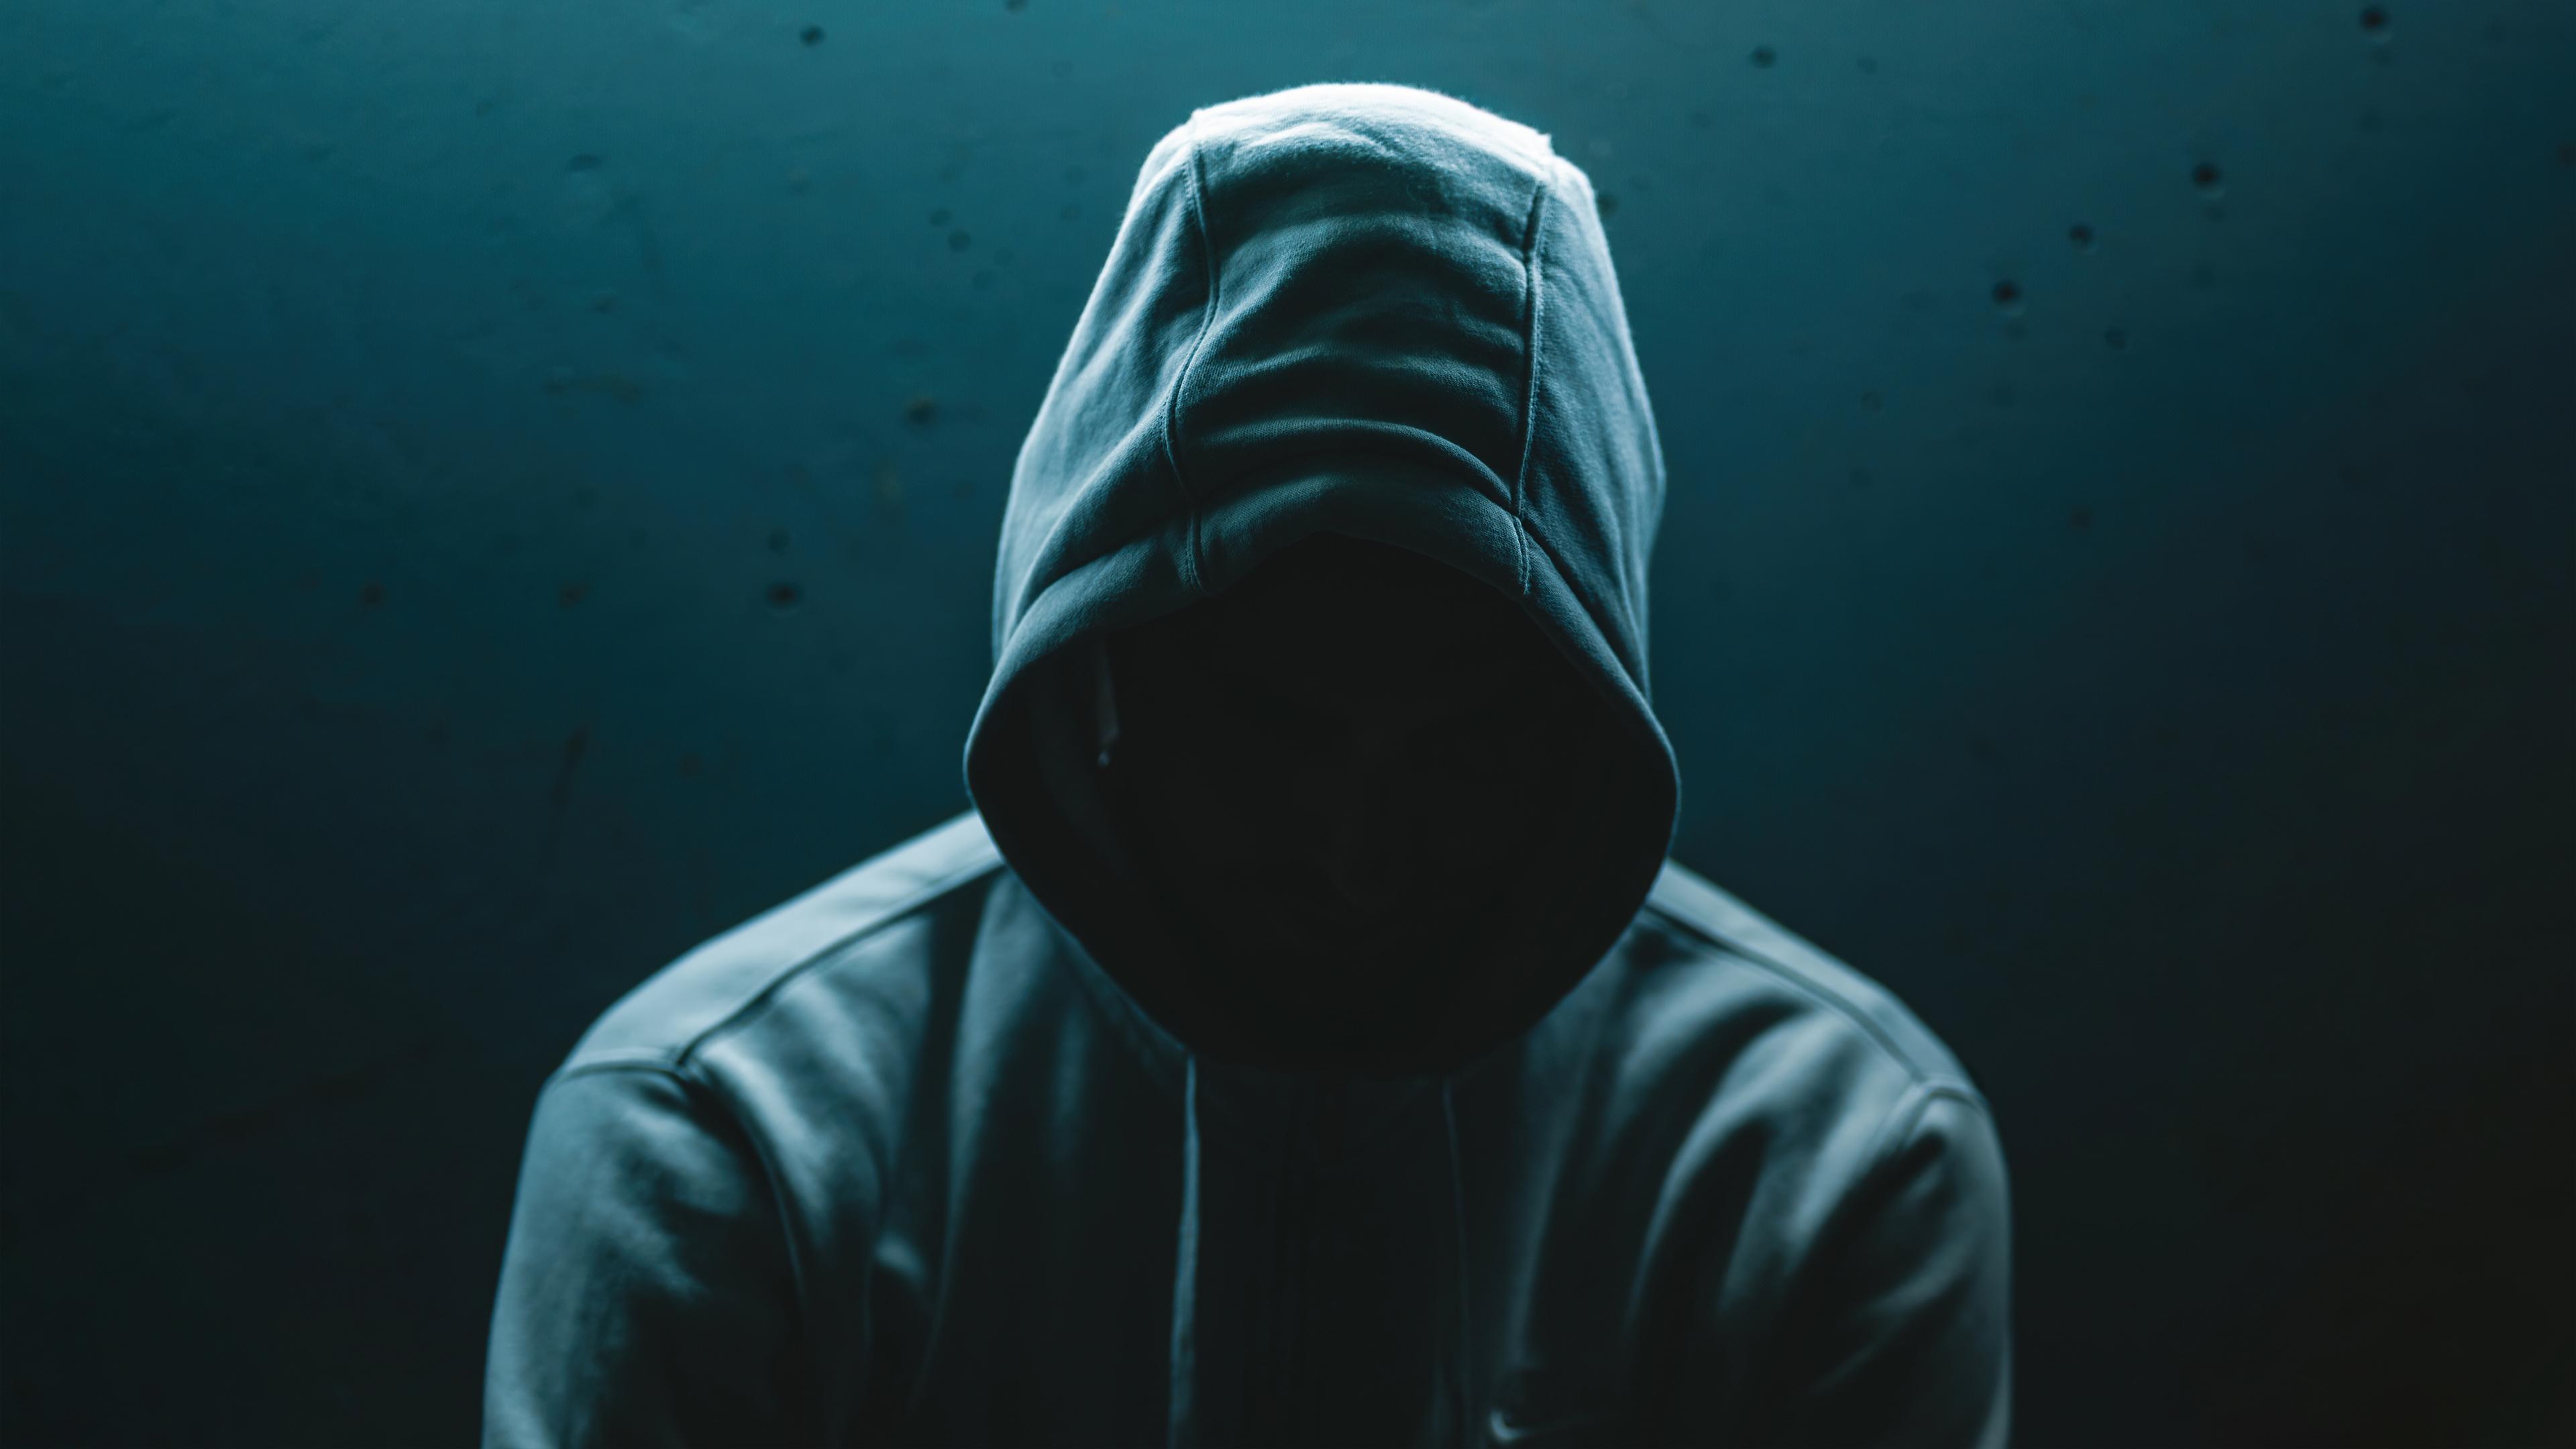 no face hoodie guy 4k 1634170427 - No Face Hoodie Guy 4k - No Face Hoodie Guy wallpapers, No Face Hoodie Guy 4k wallpapers